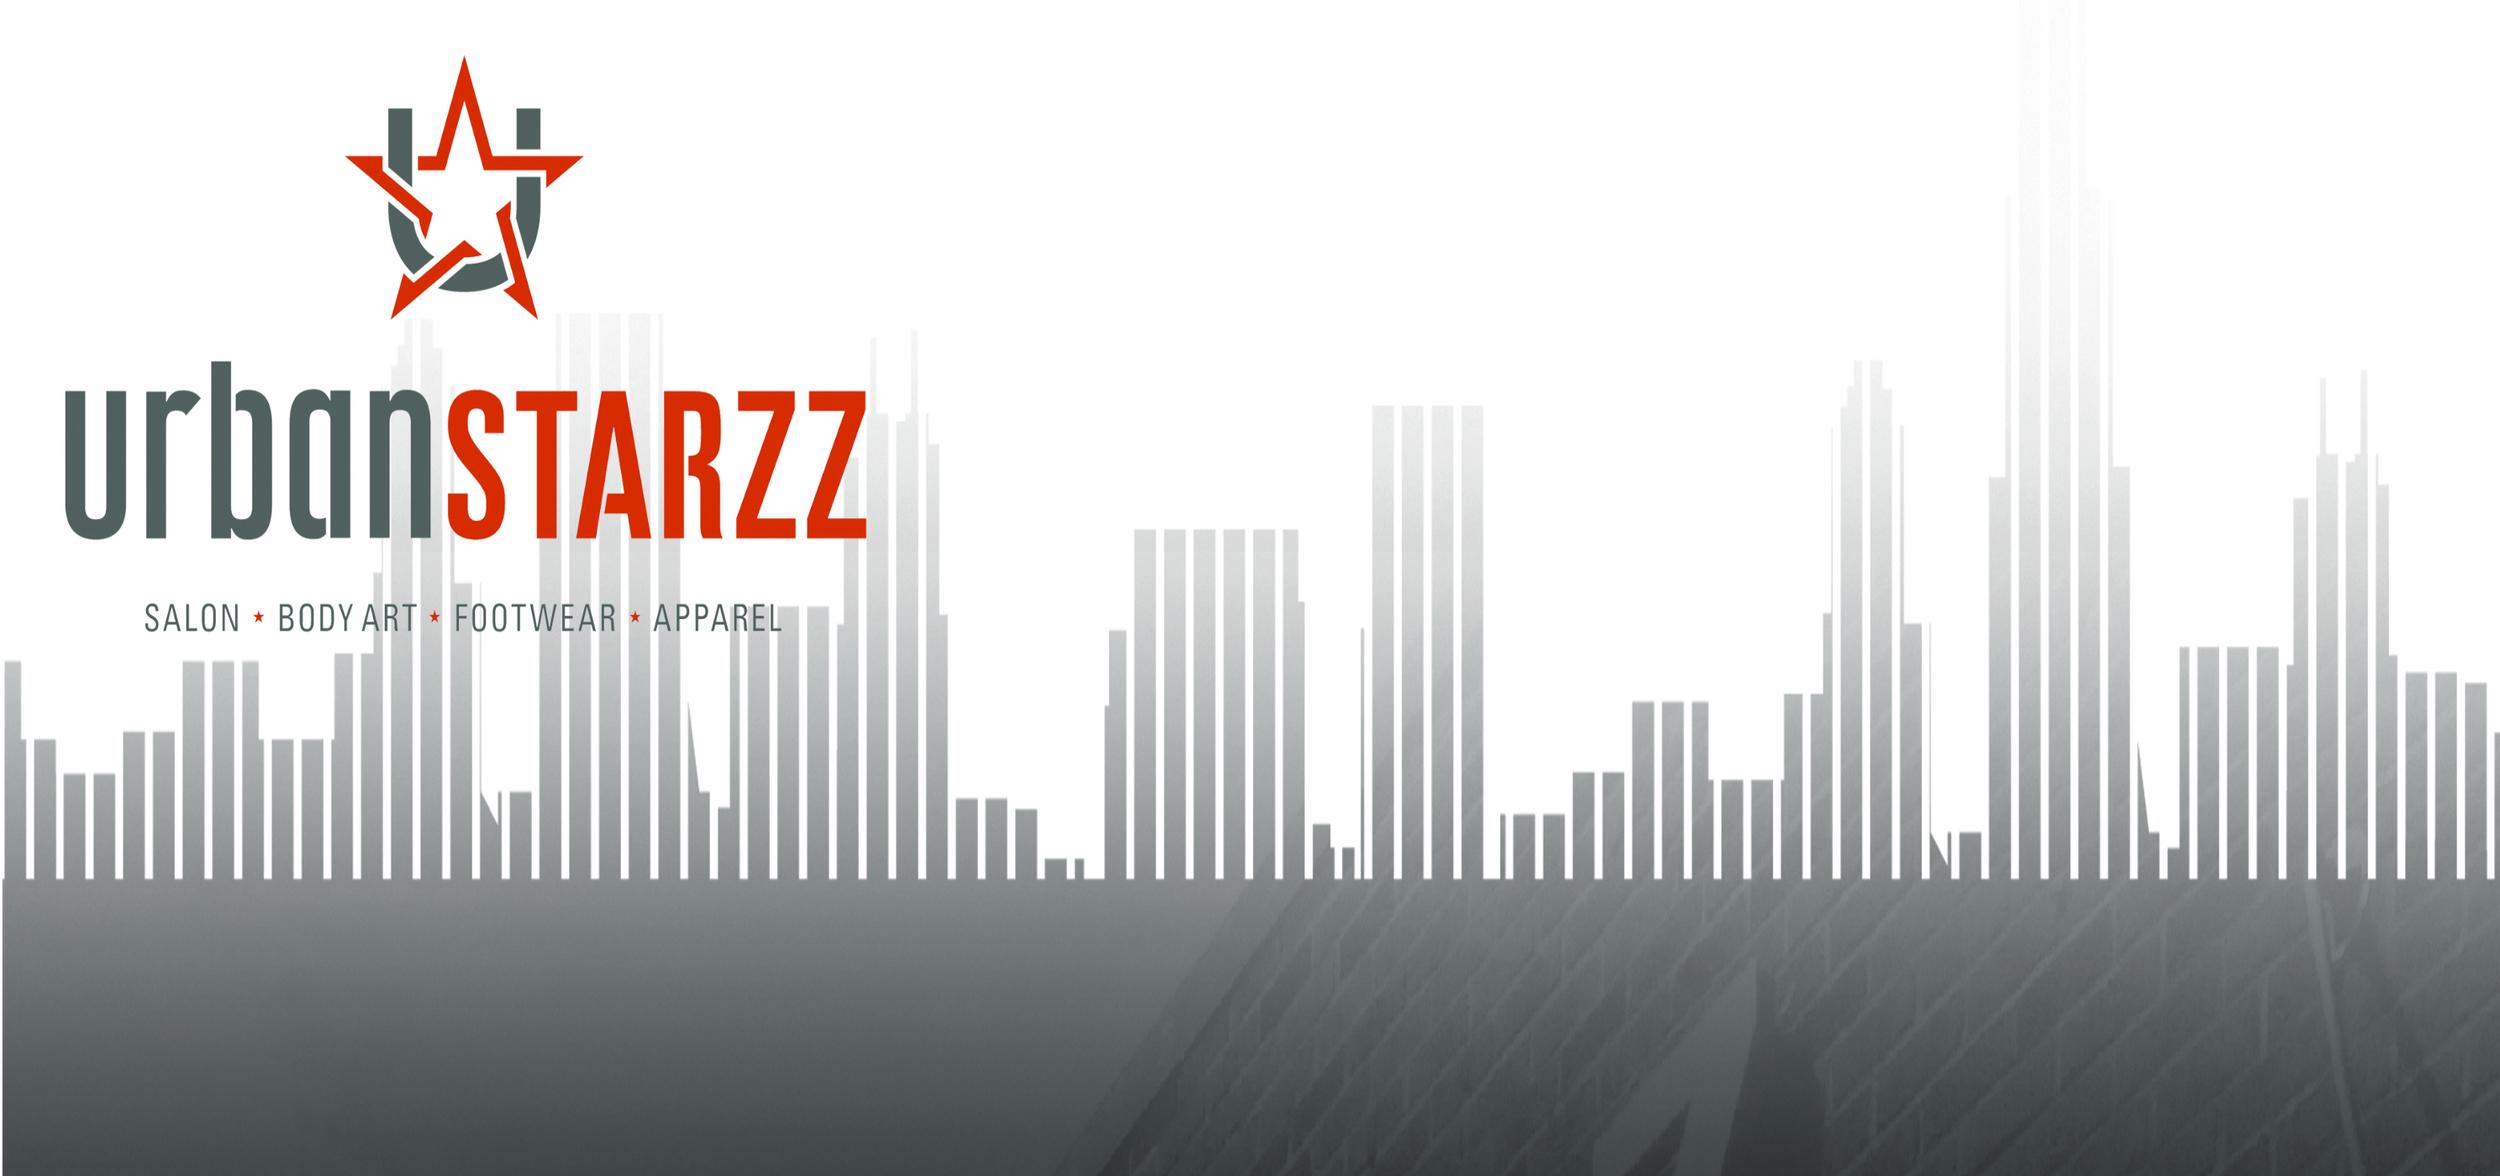 UrbanStarzzFlyer_2 copy.jpg